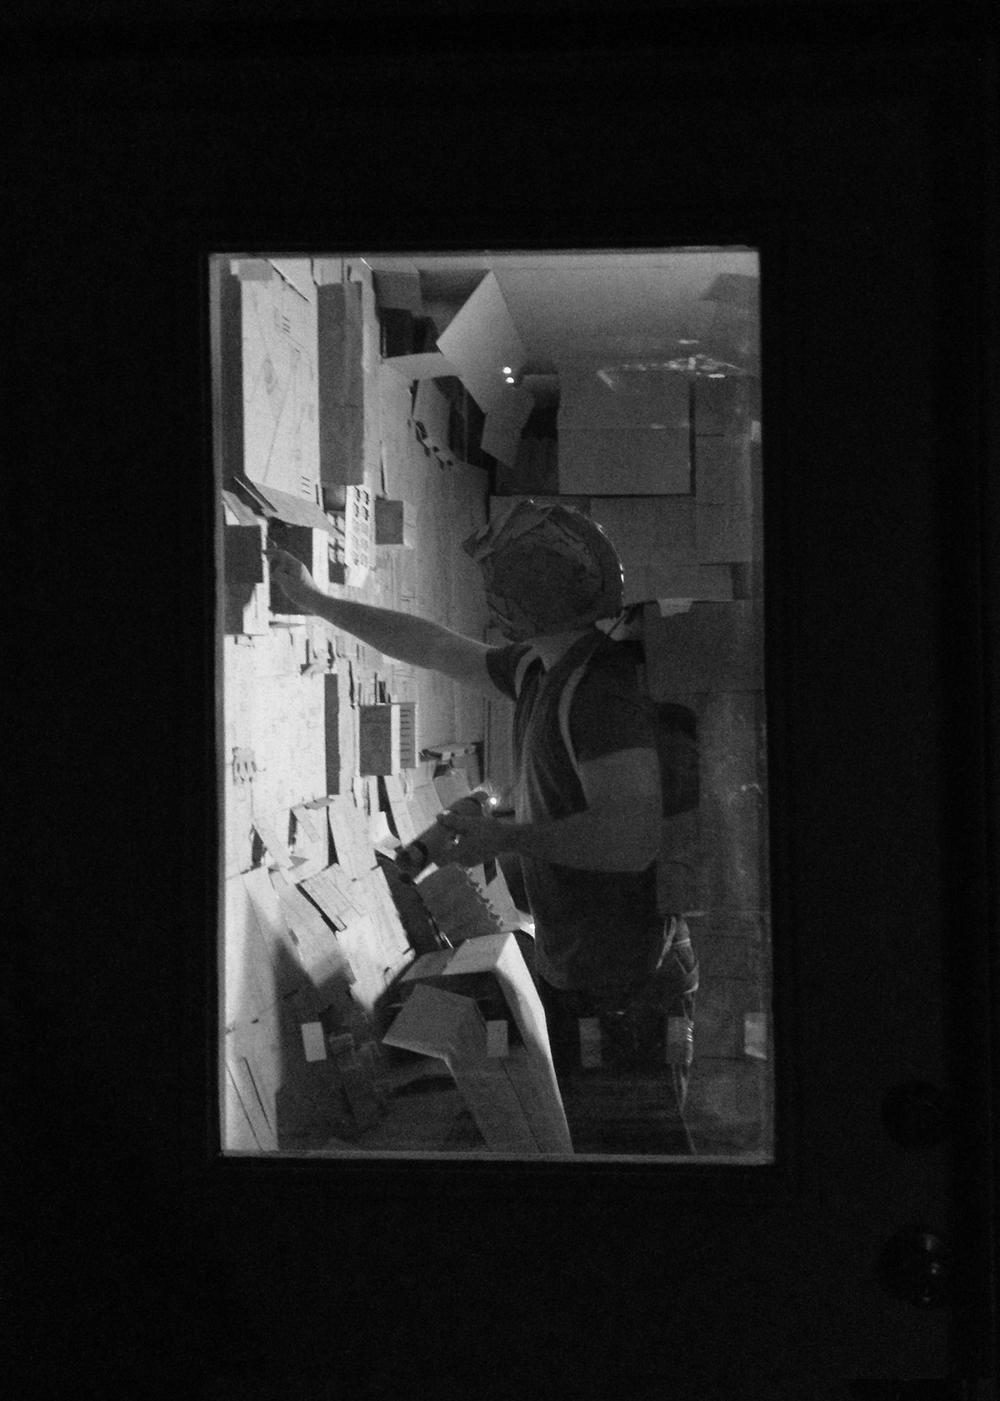 JoshFunk-TheSpaceman-4.jpg